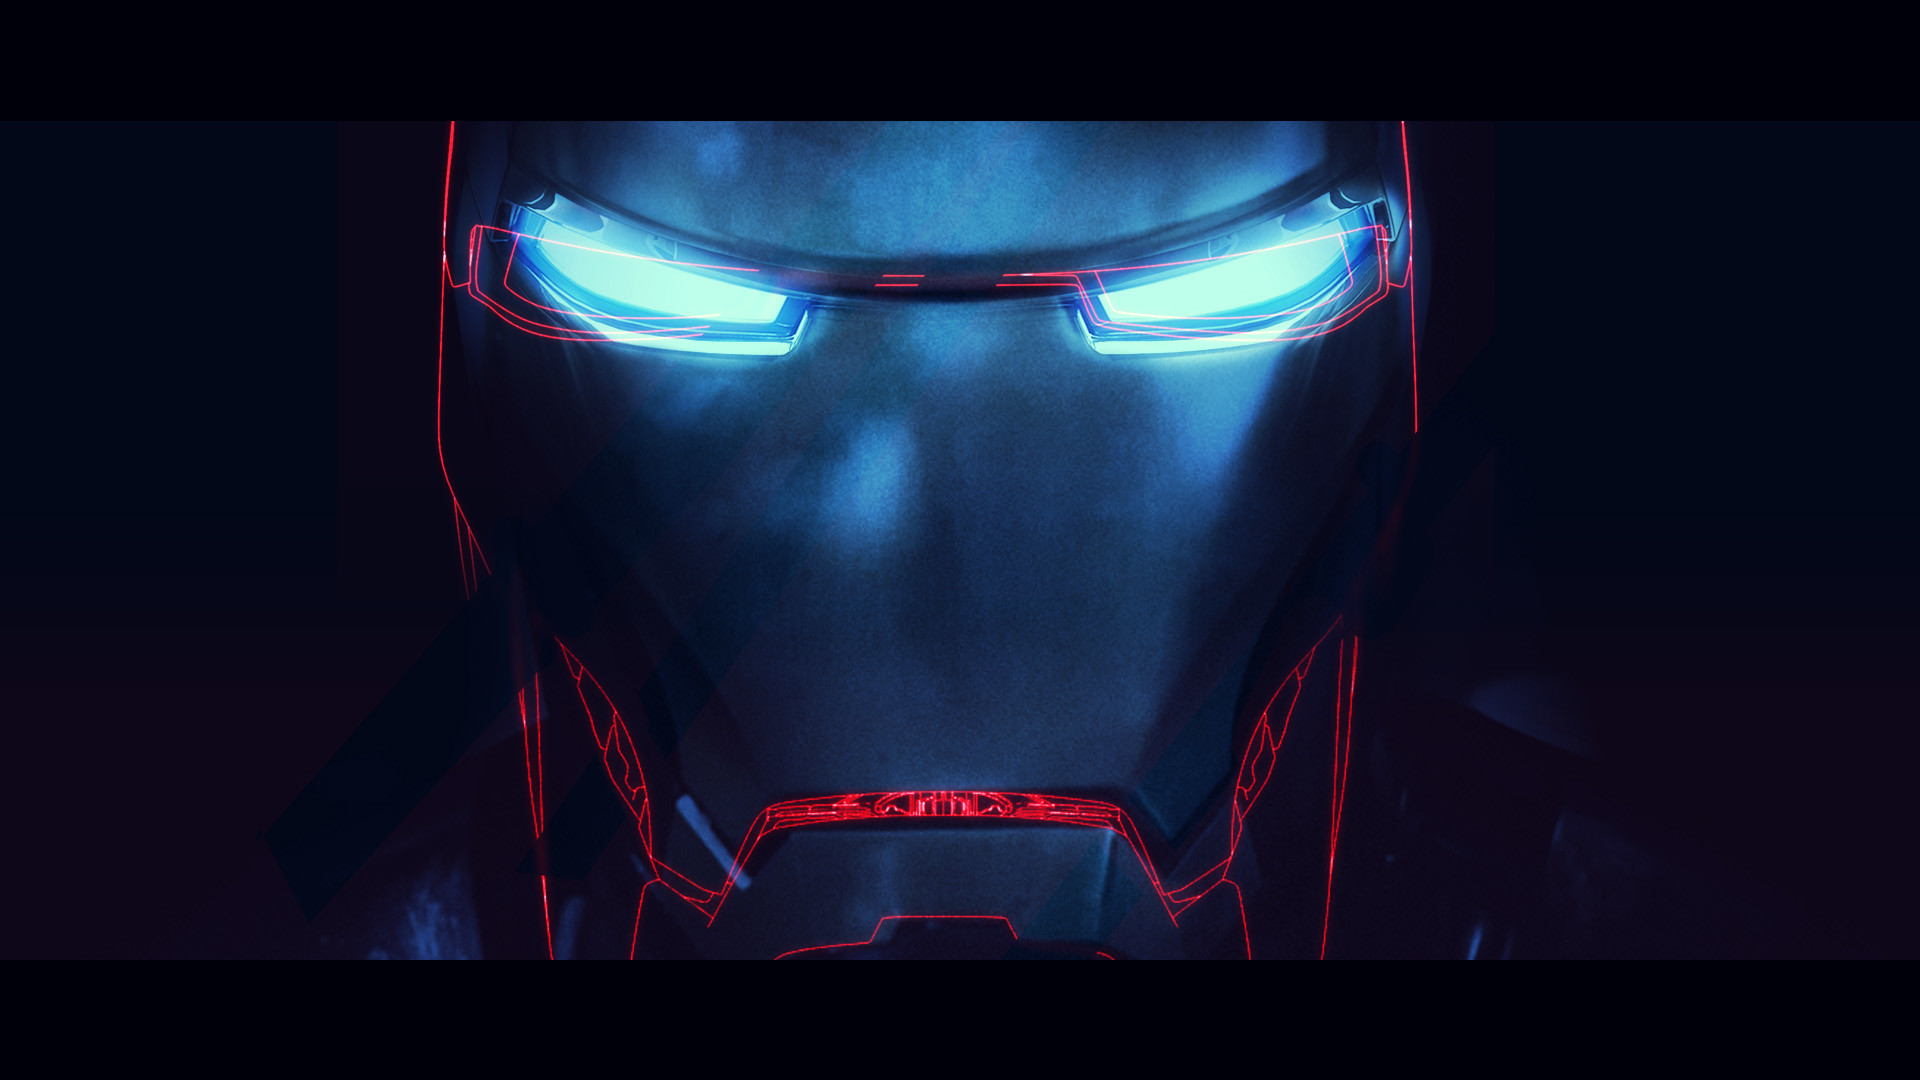 Iron Man 3 Computer Wallpapers, Desktop Backgrounds     ID .